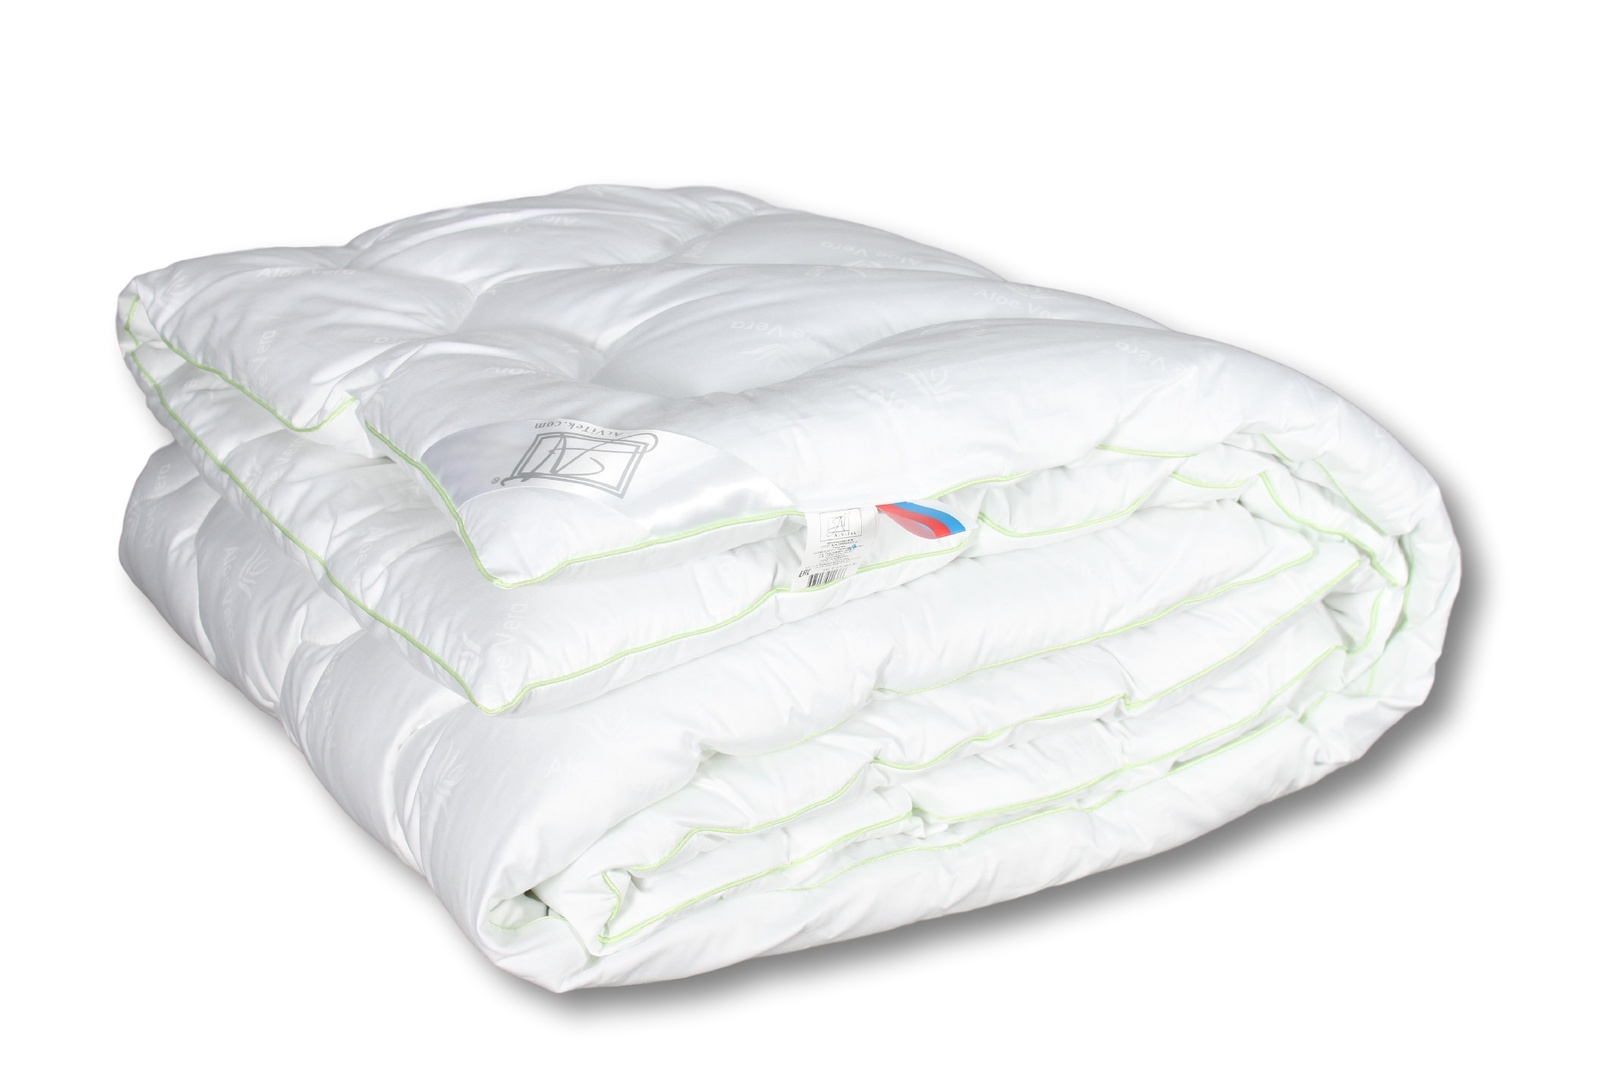 Одеяло Альвитек Алоэ Люкс классическое, размер 172х205 plitex aloe vera soft